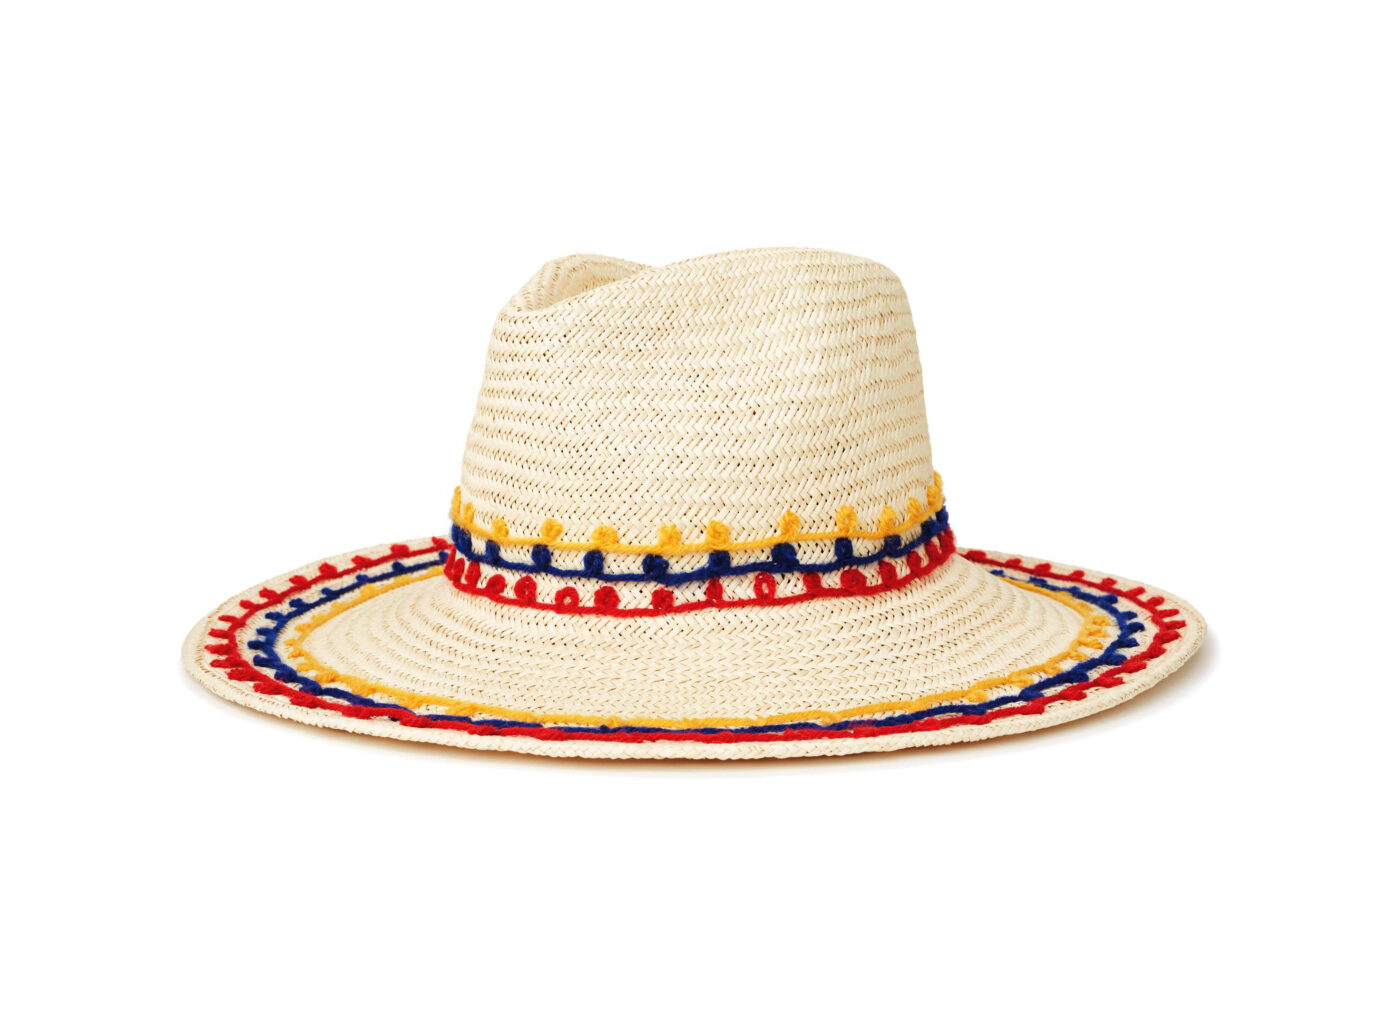 Brixton Joanna Embroidered Straw Hat